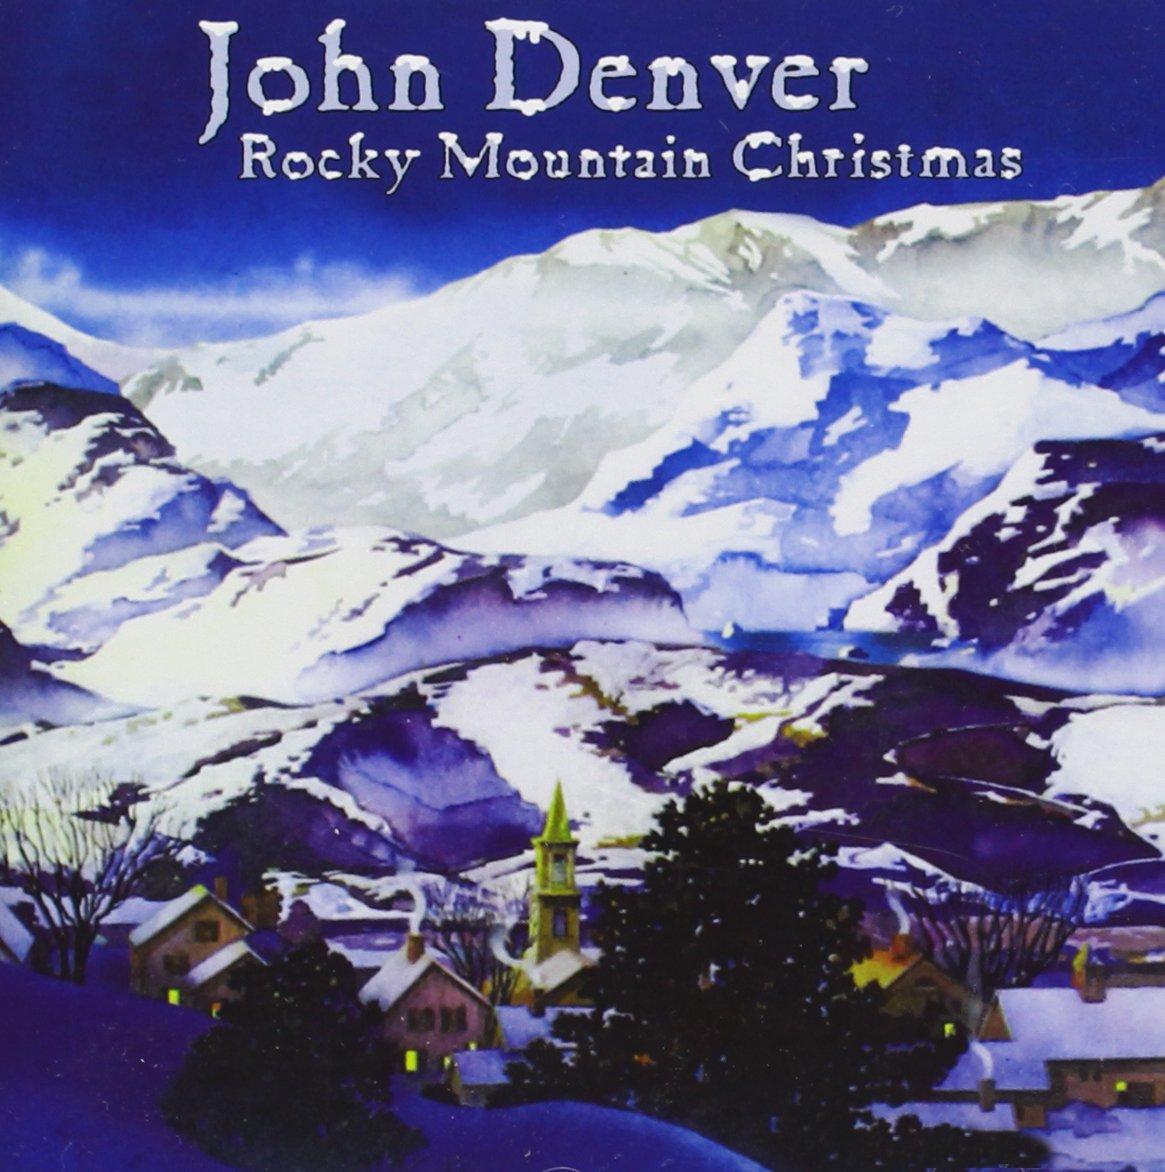 Rocky Mountain Christmas by John Denver: Amazon.co.uk: Music